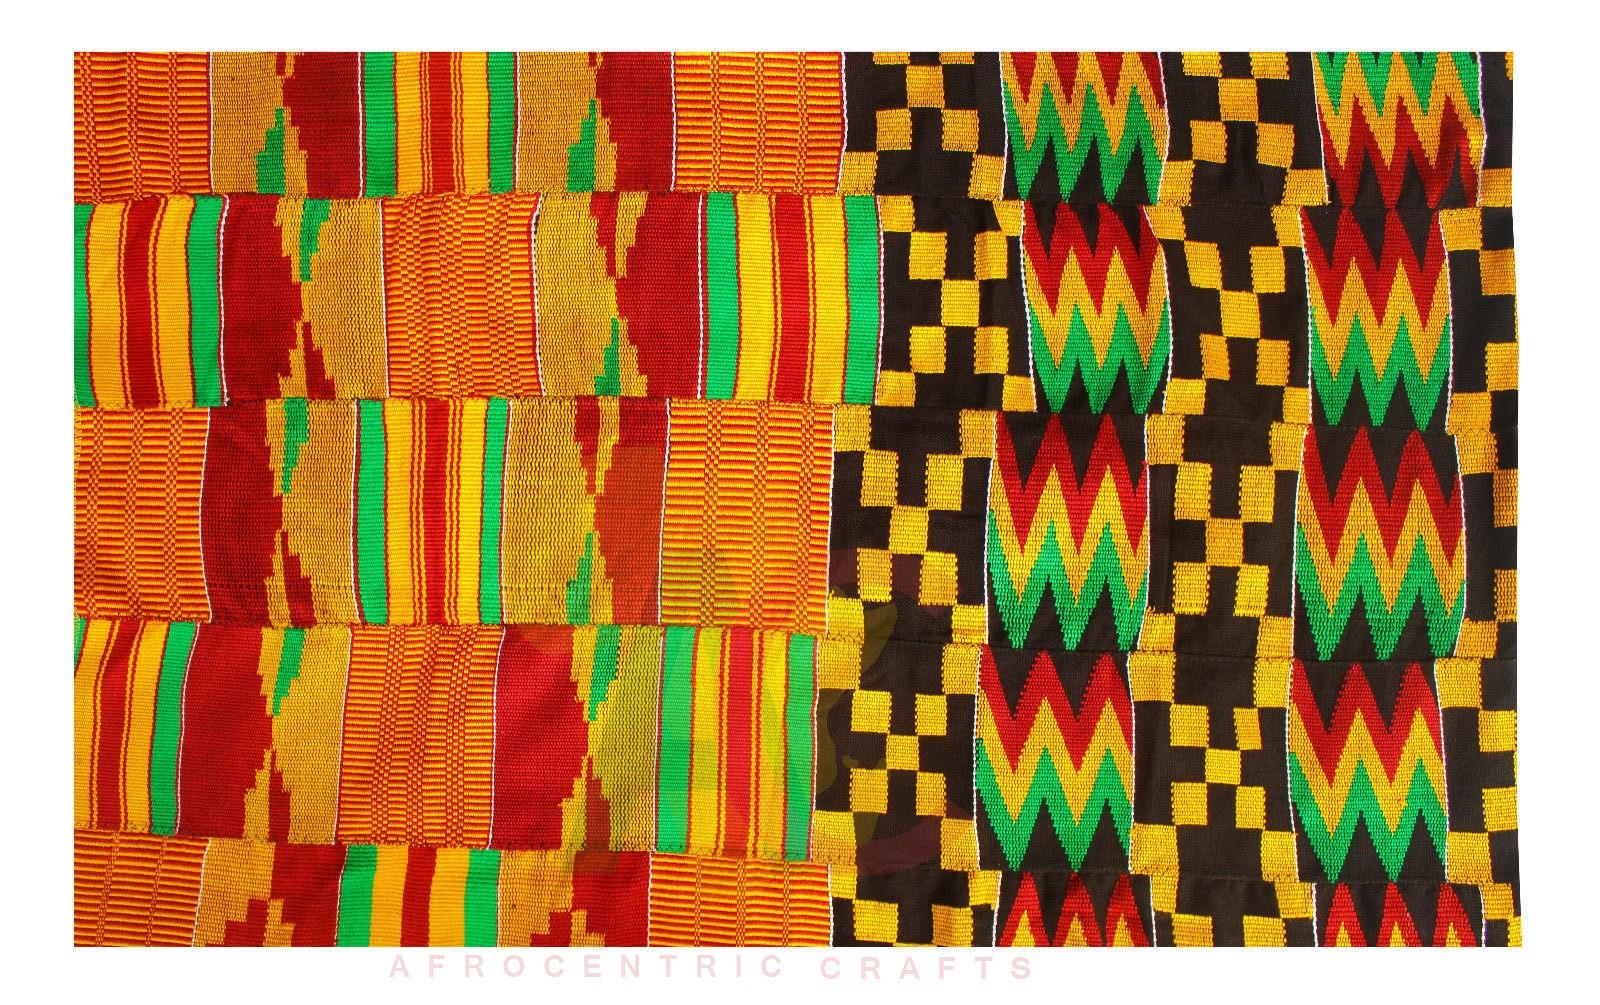 Kente Kente Kente tissé à la main en tissu Asante du Ghana africain Art Ashanti Textile tissu 6 yards f3afe2